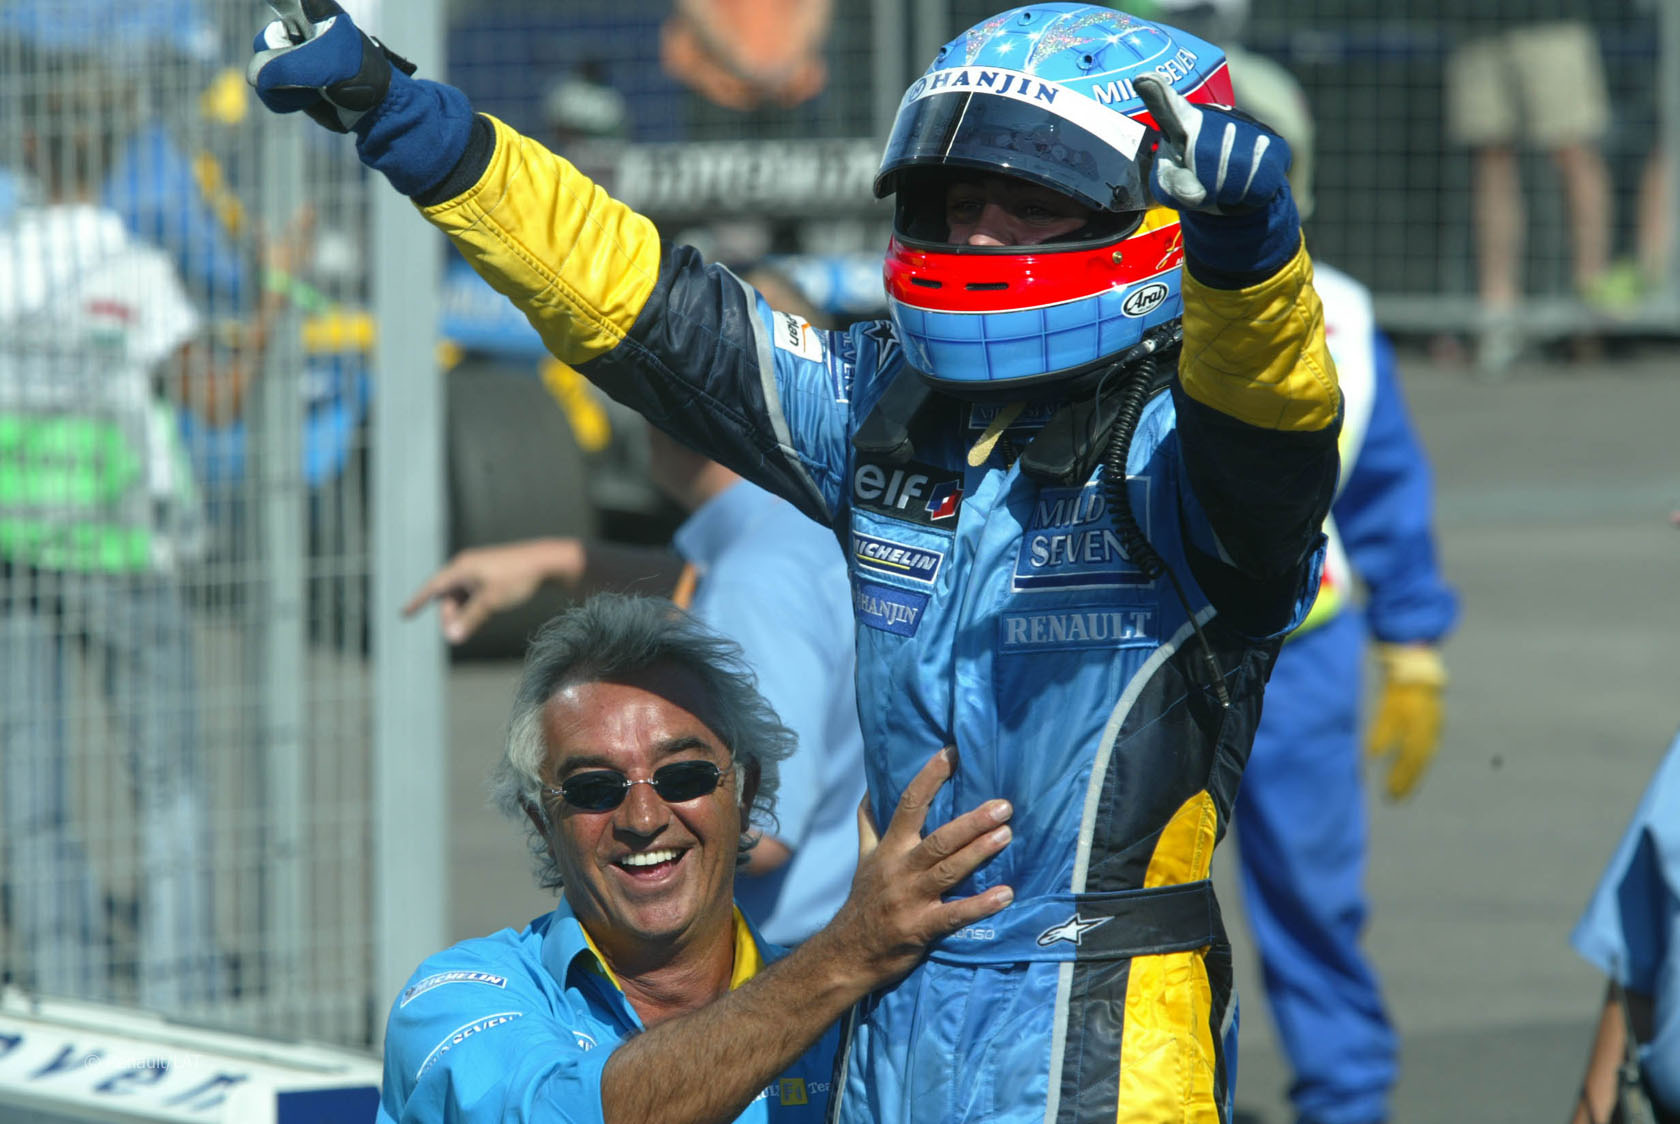 Fernando Alonso Celebración GP Hungria 2003